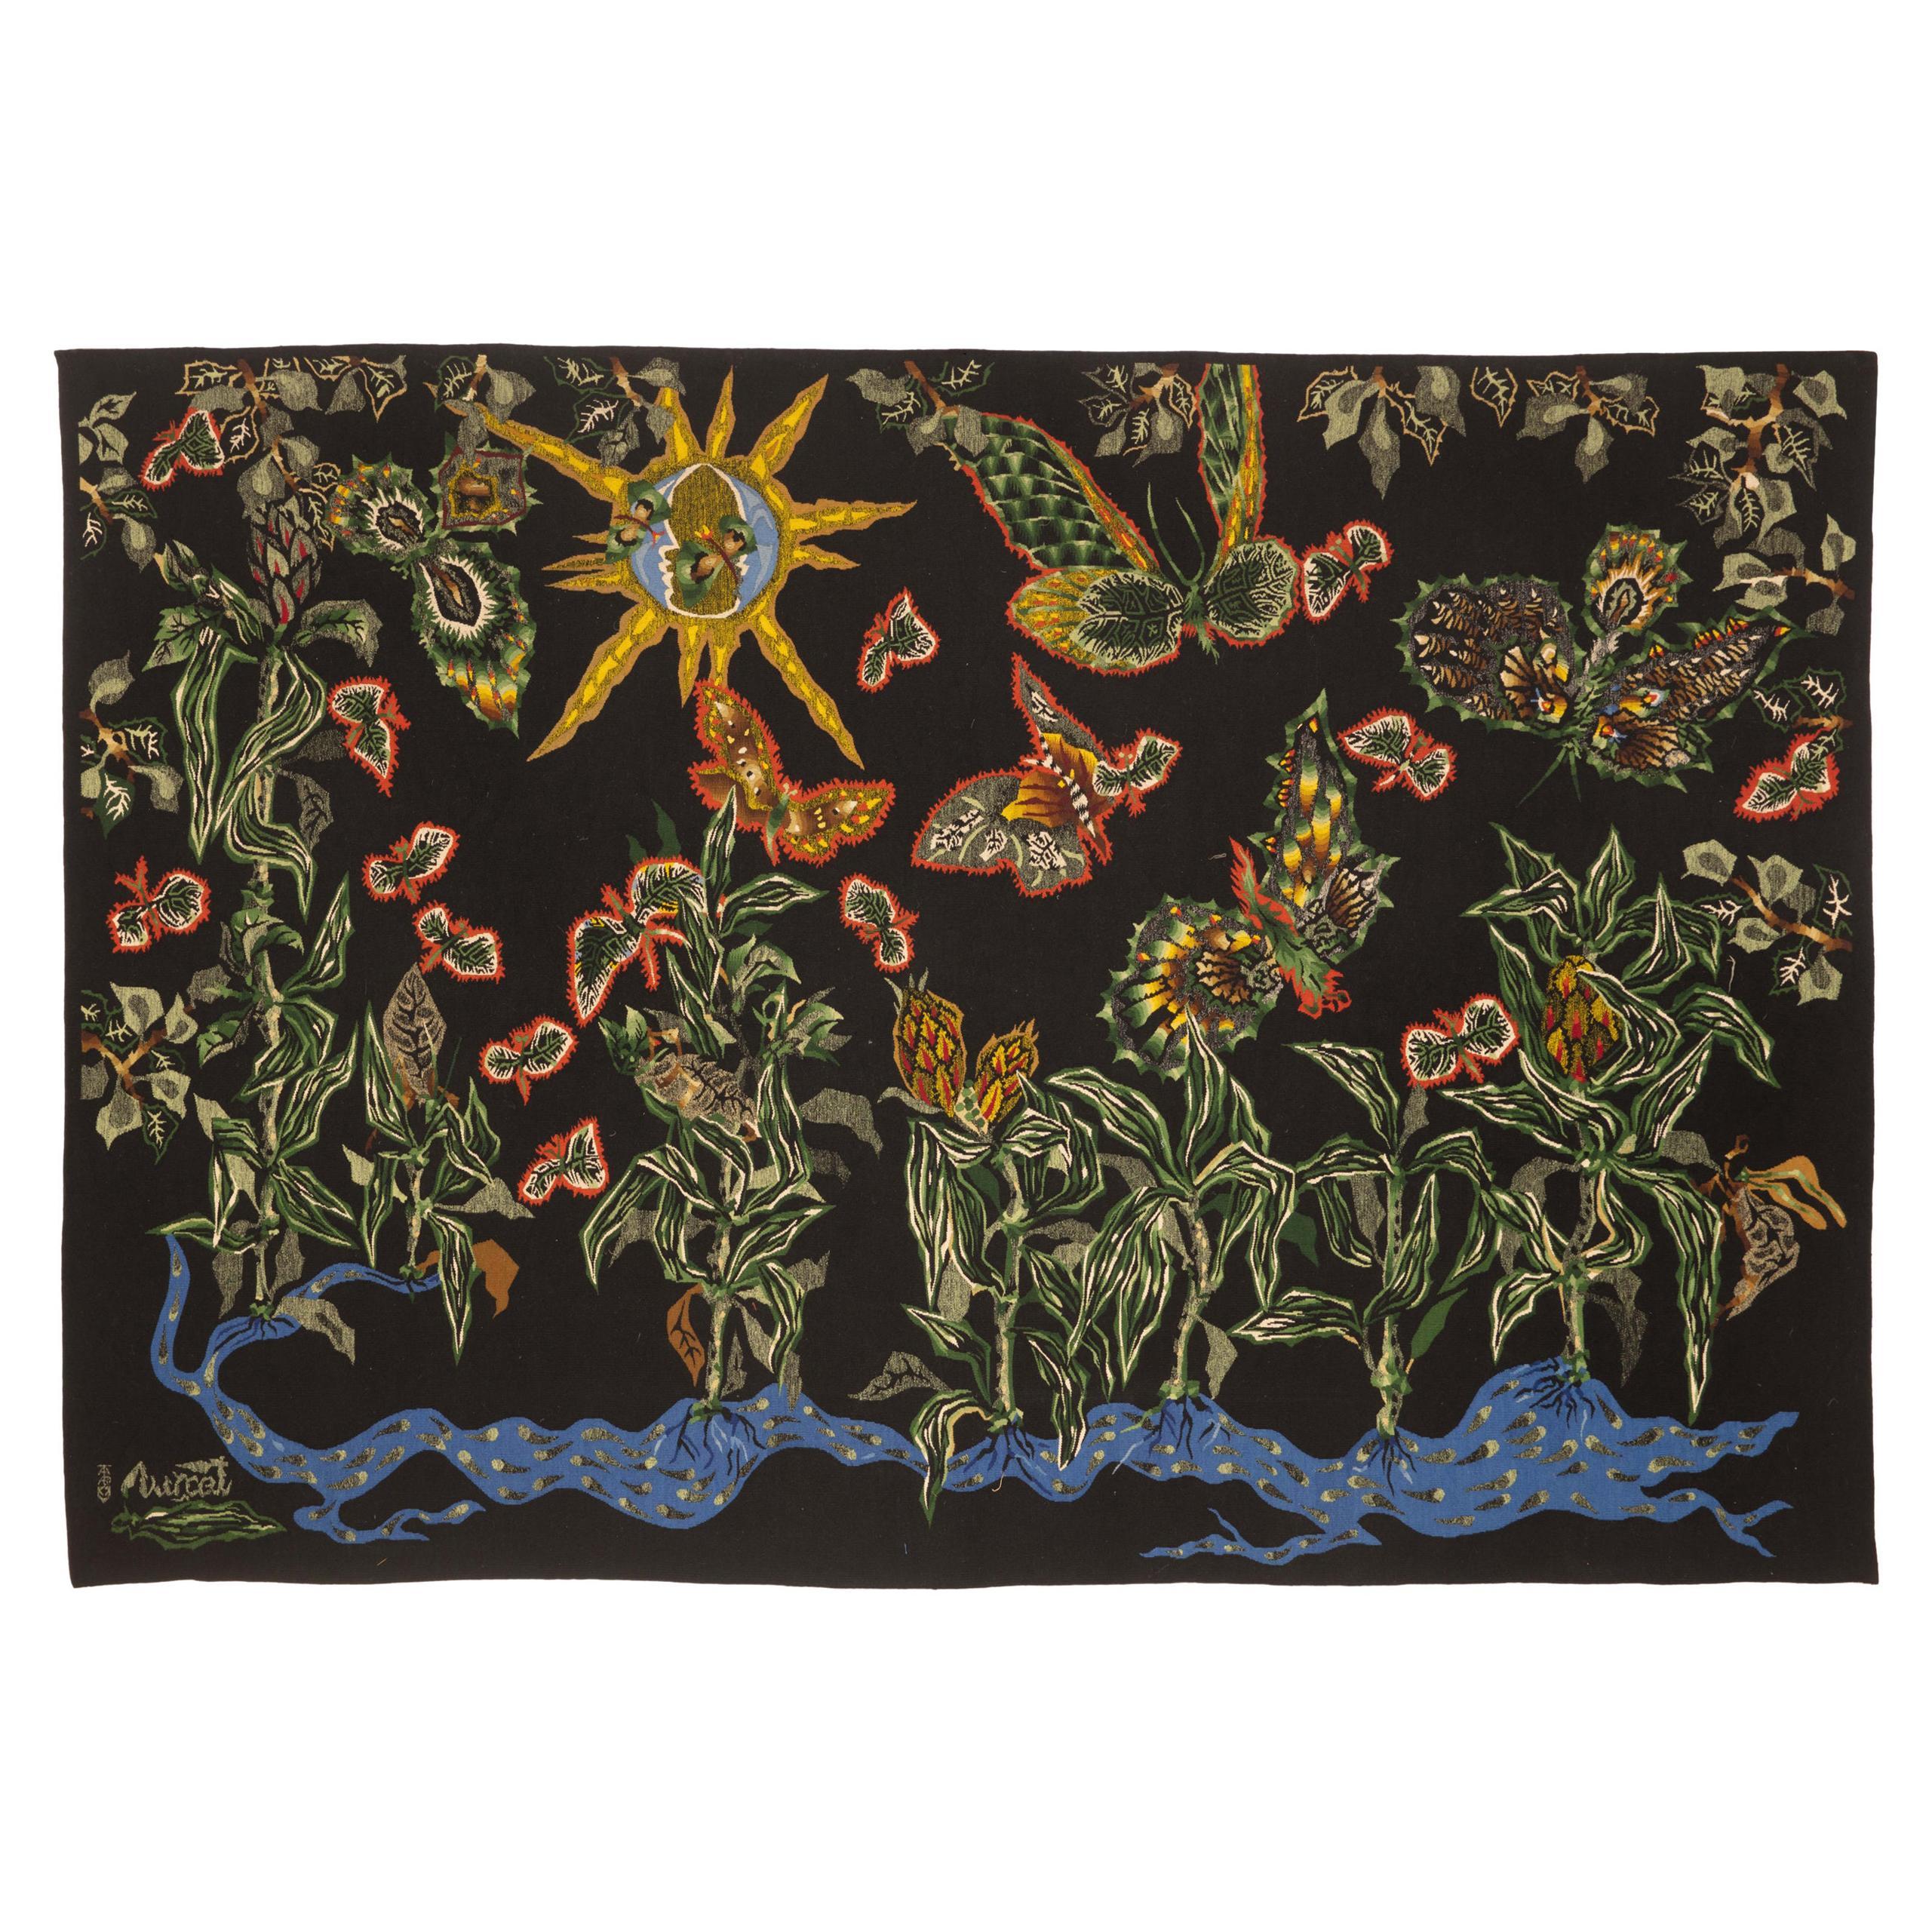 "Amazing Wool Tapestry by Jean Lurçat ""Black Cotonou"", Tabard Frères et Soeurs"